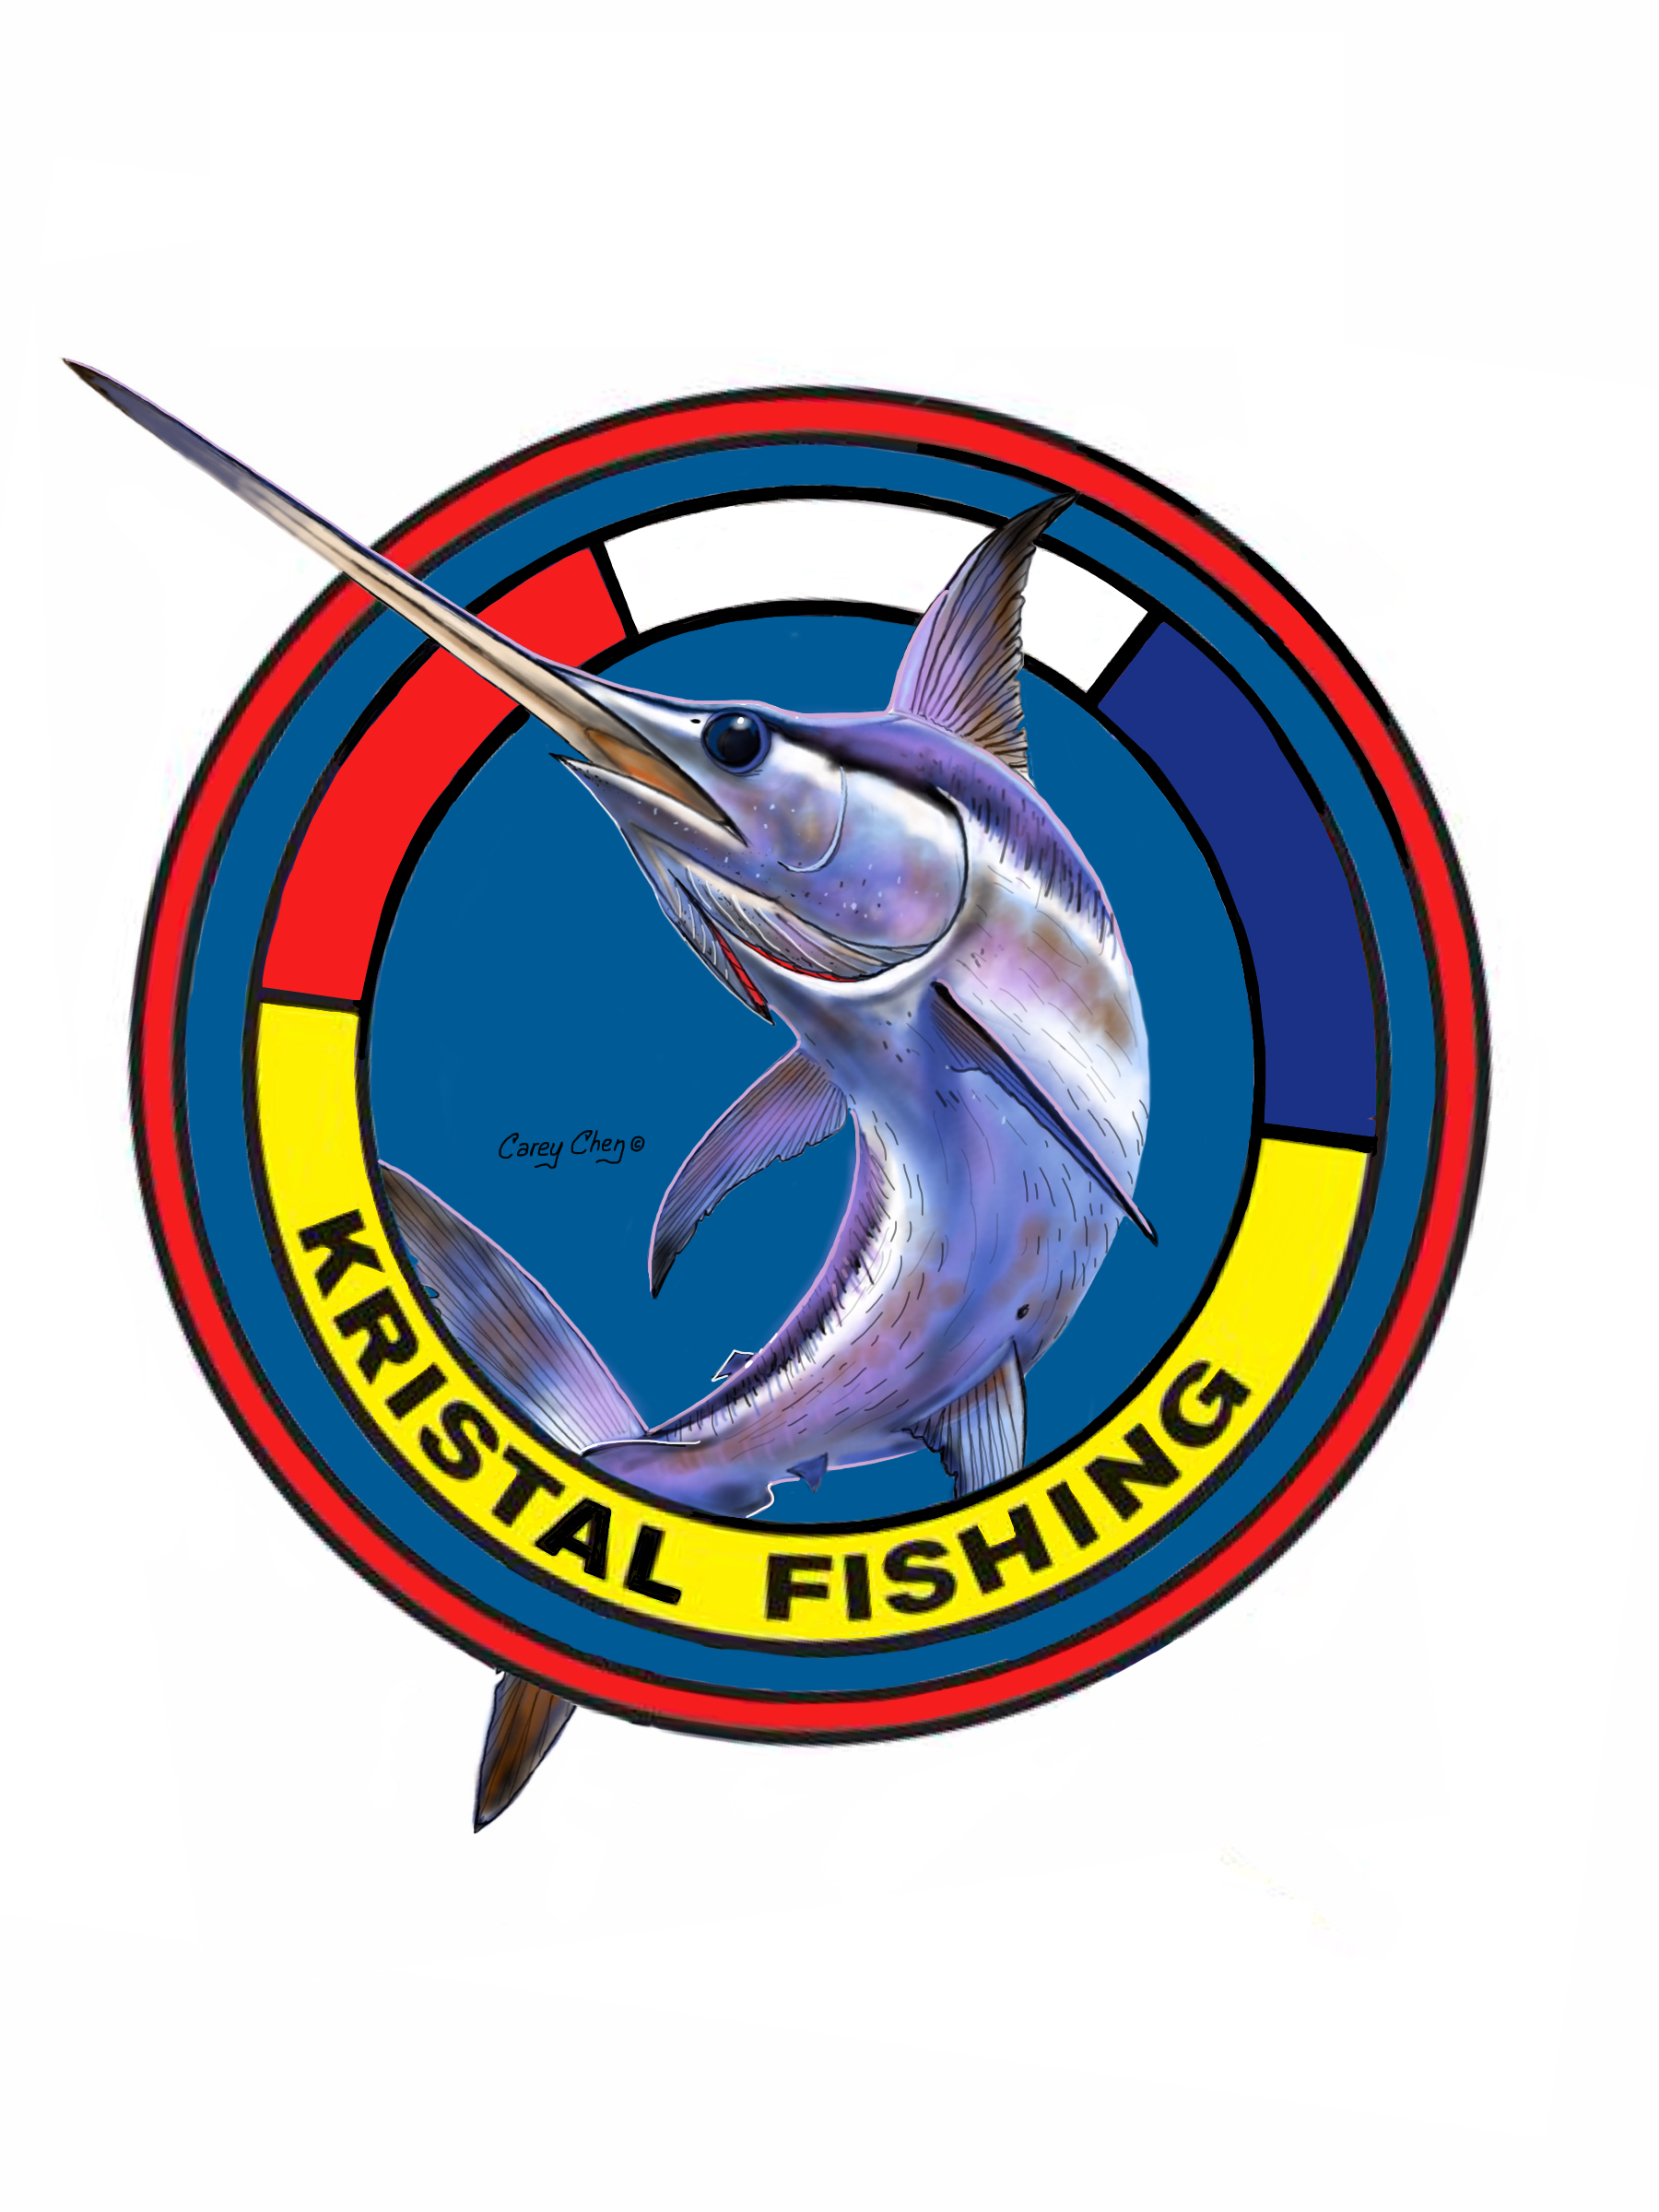 Kristal Fishing